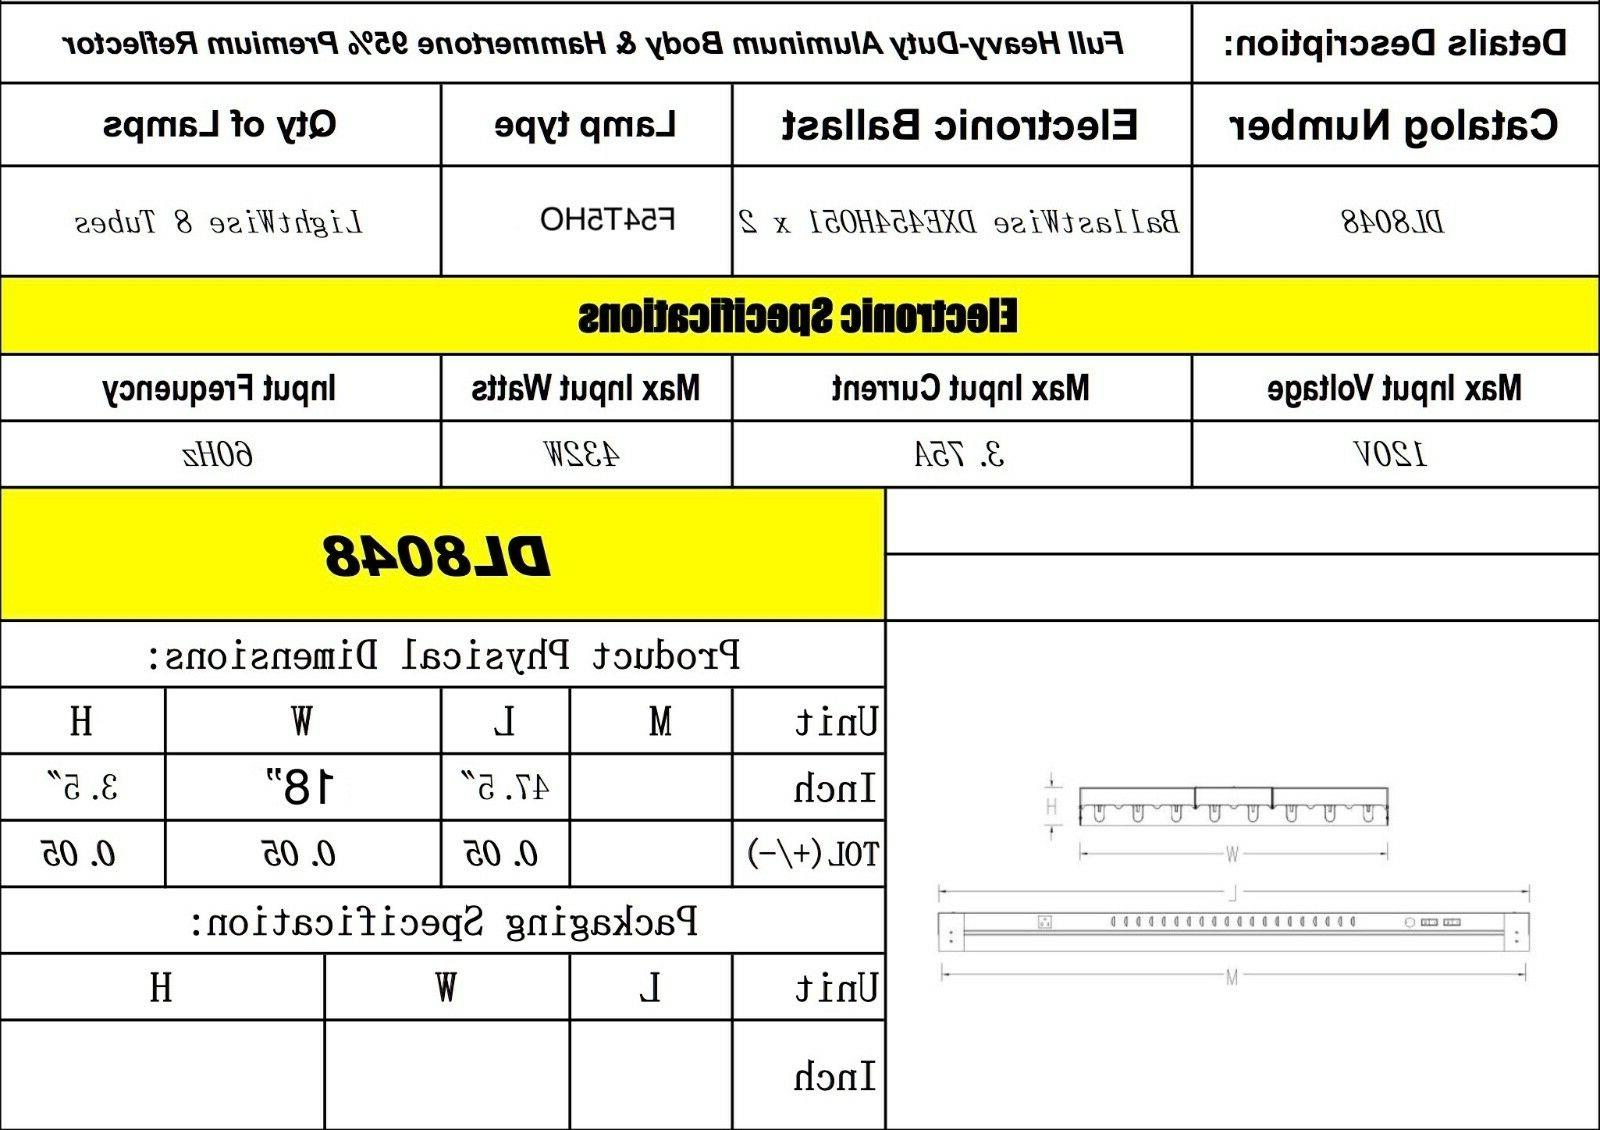 DUROLUX T5 HO INDOOR GROW FT BULB DL8048 FLUORESCENT